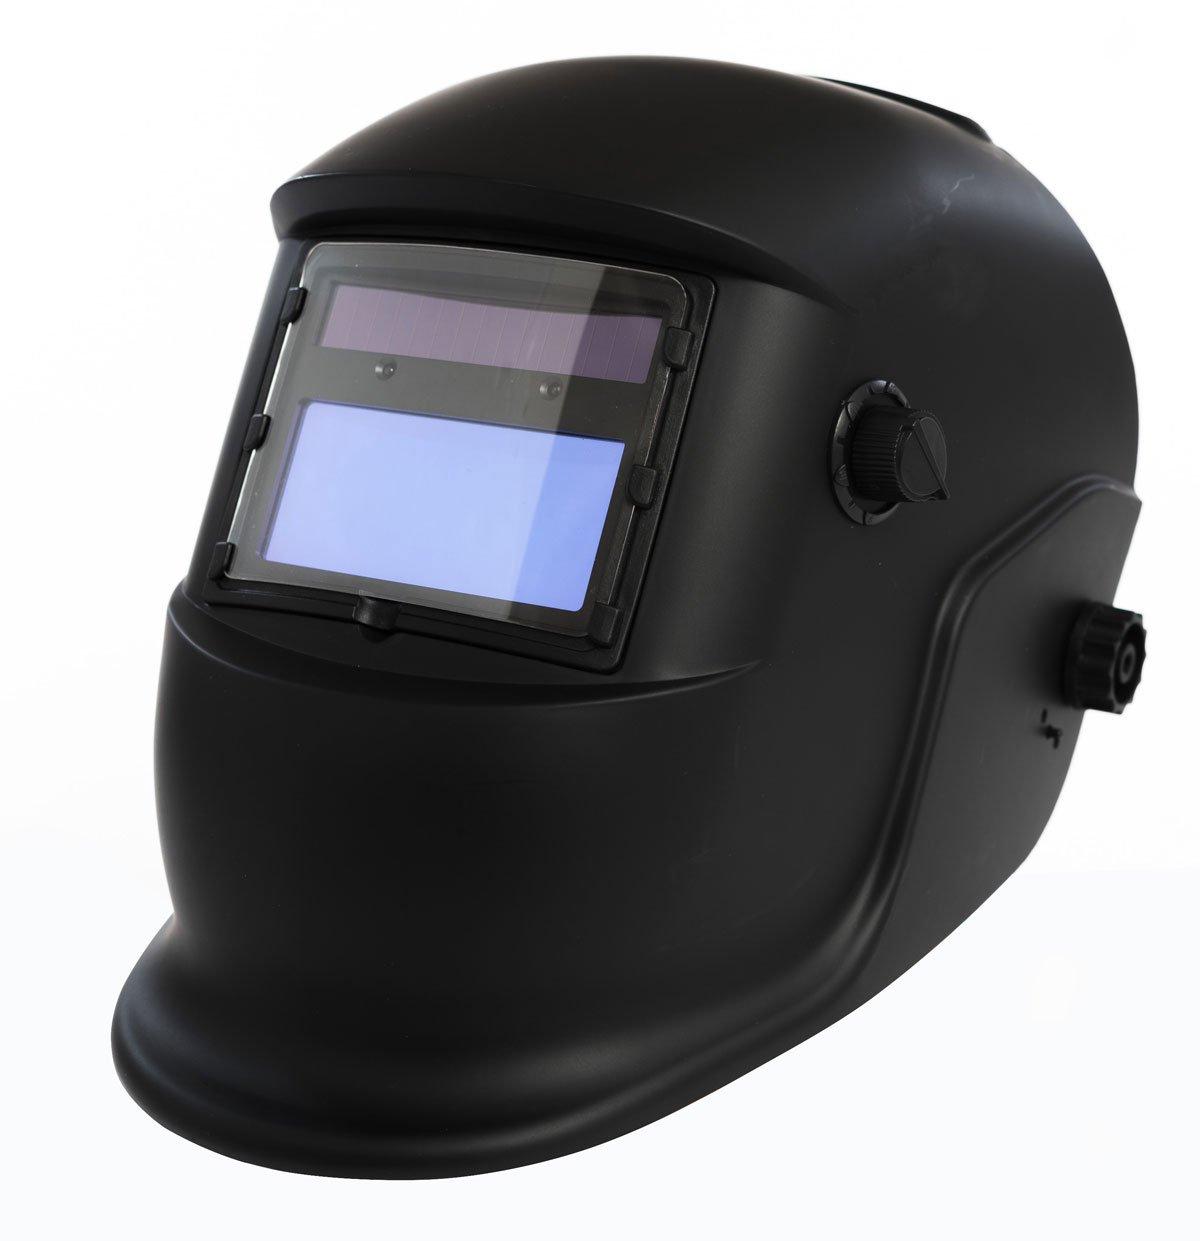 Schweiß helm Automatik Schweiß maske LCD Solar inkl. 11 + 1 qualitative Ersatzglä ser awshop24